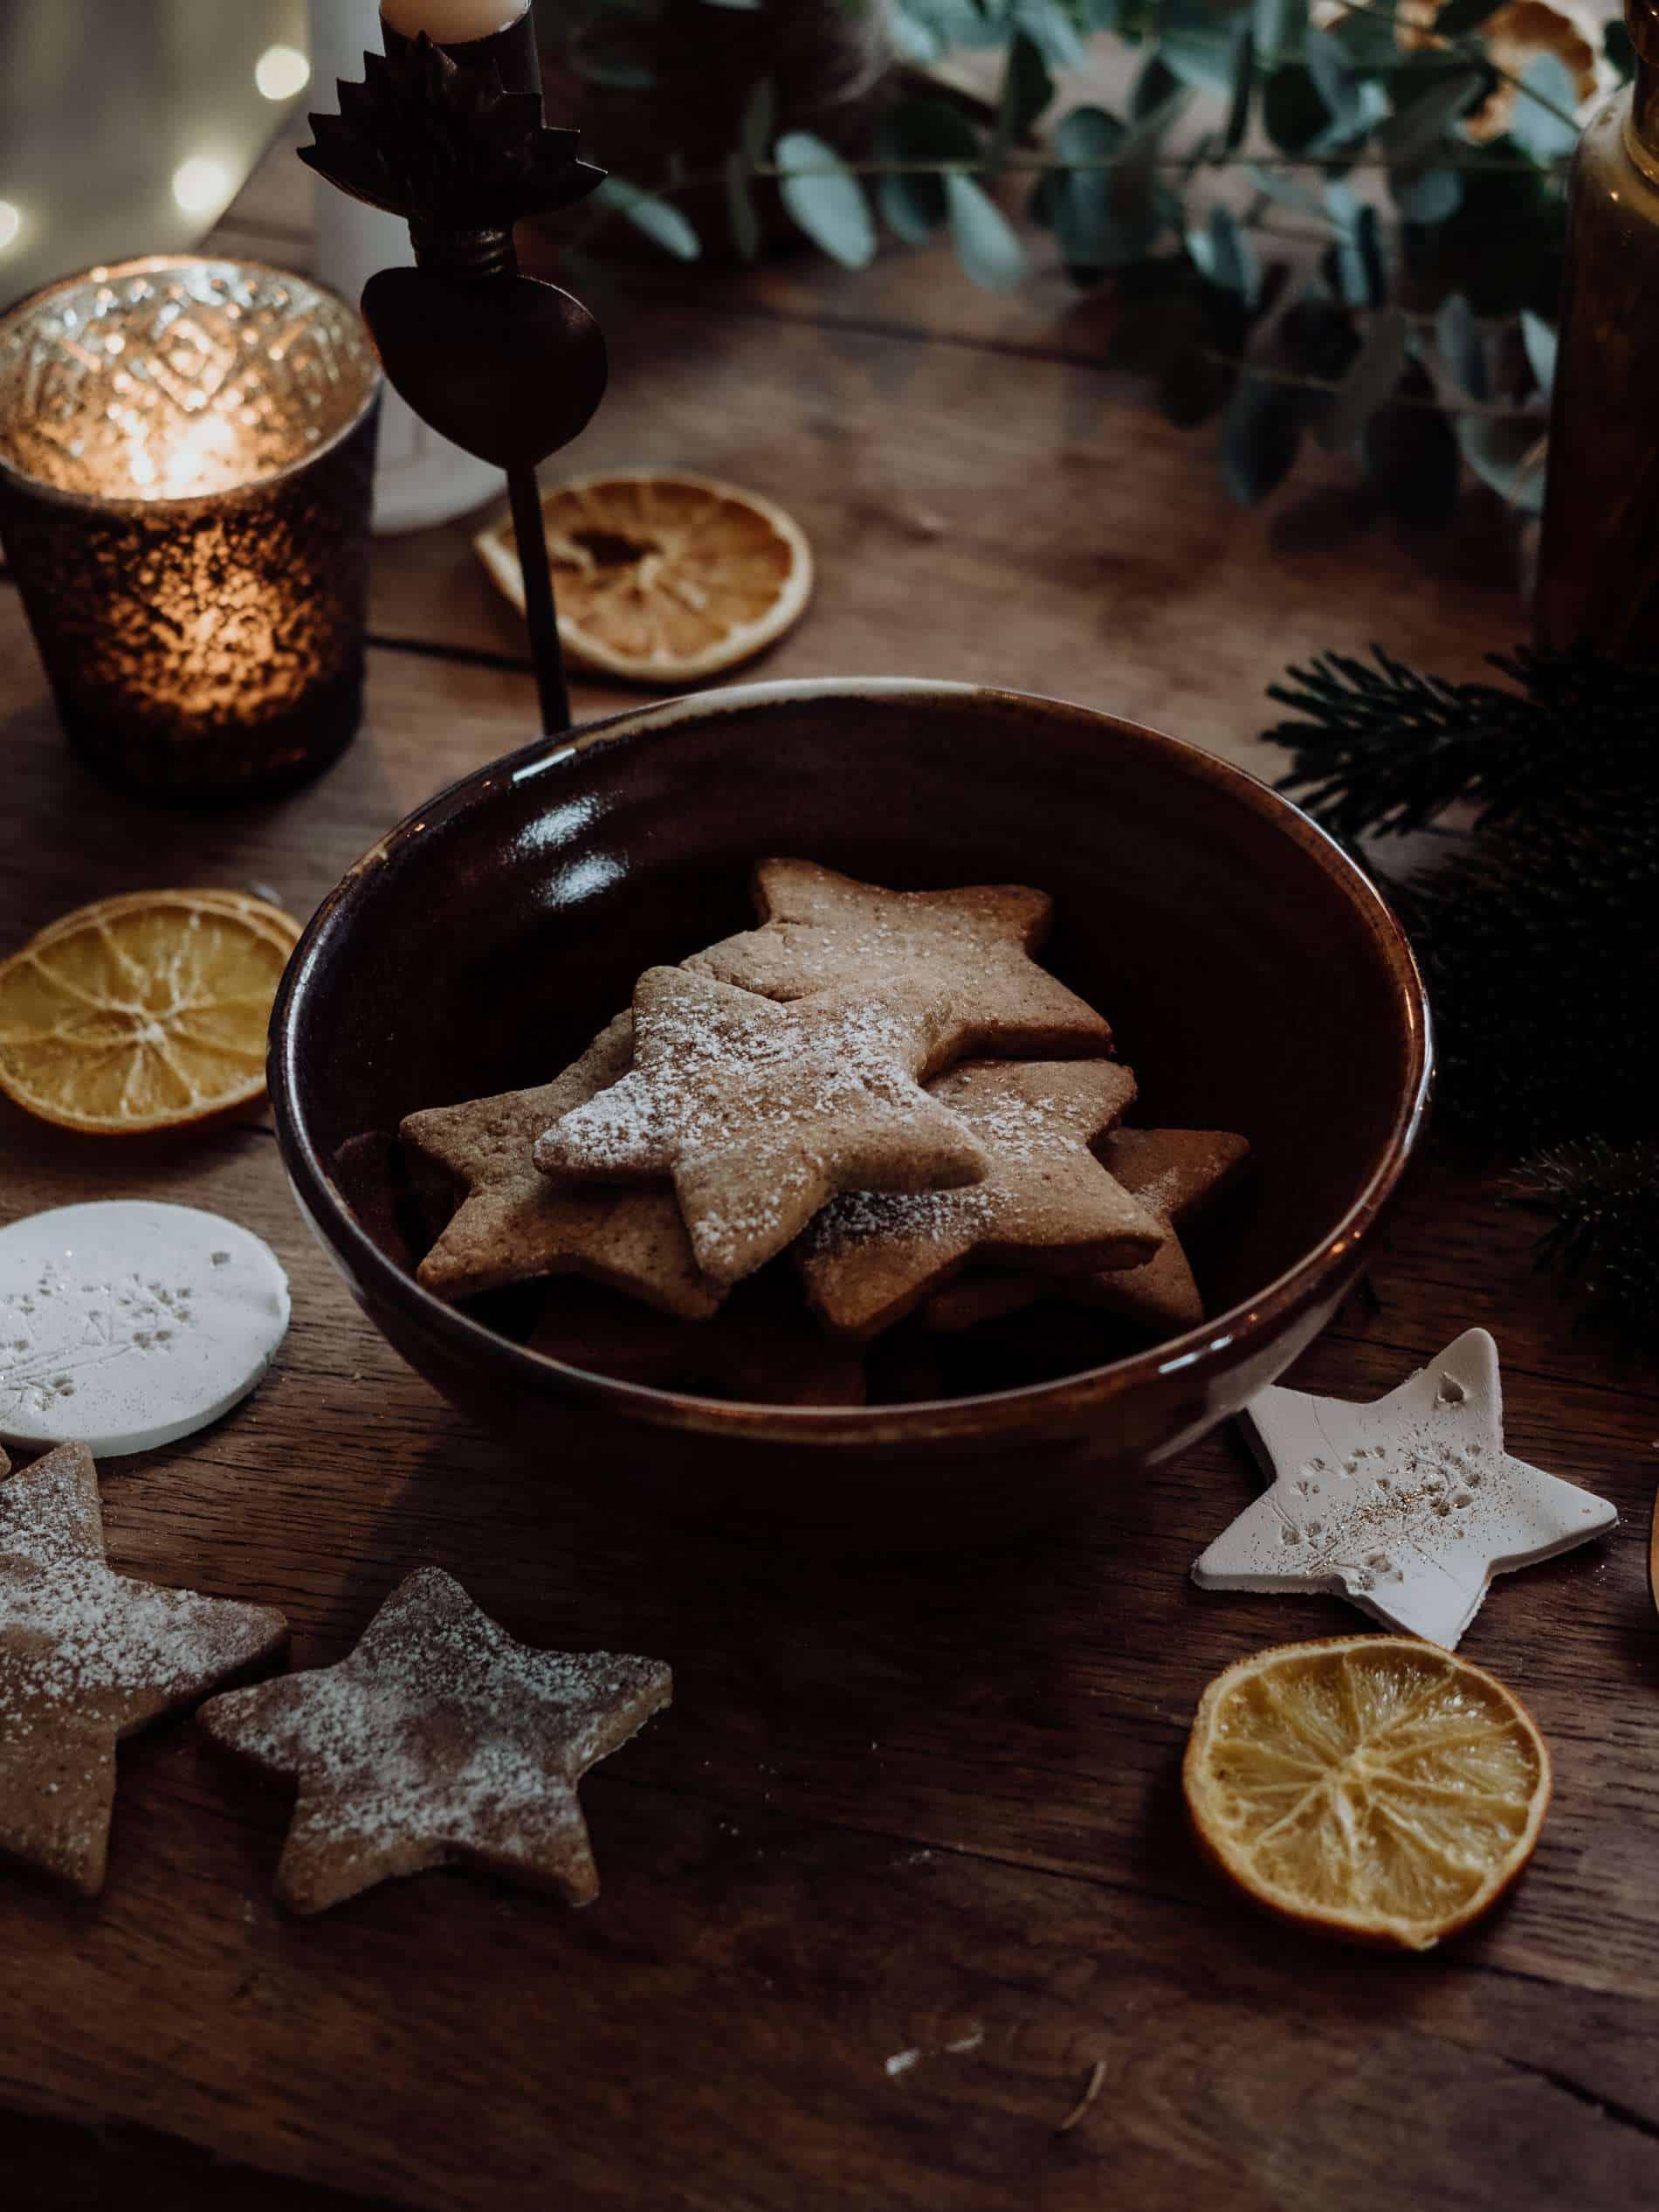 sablés de Noël table de Noël kinfolk deco lili in wonderland